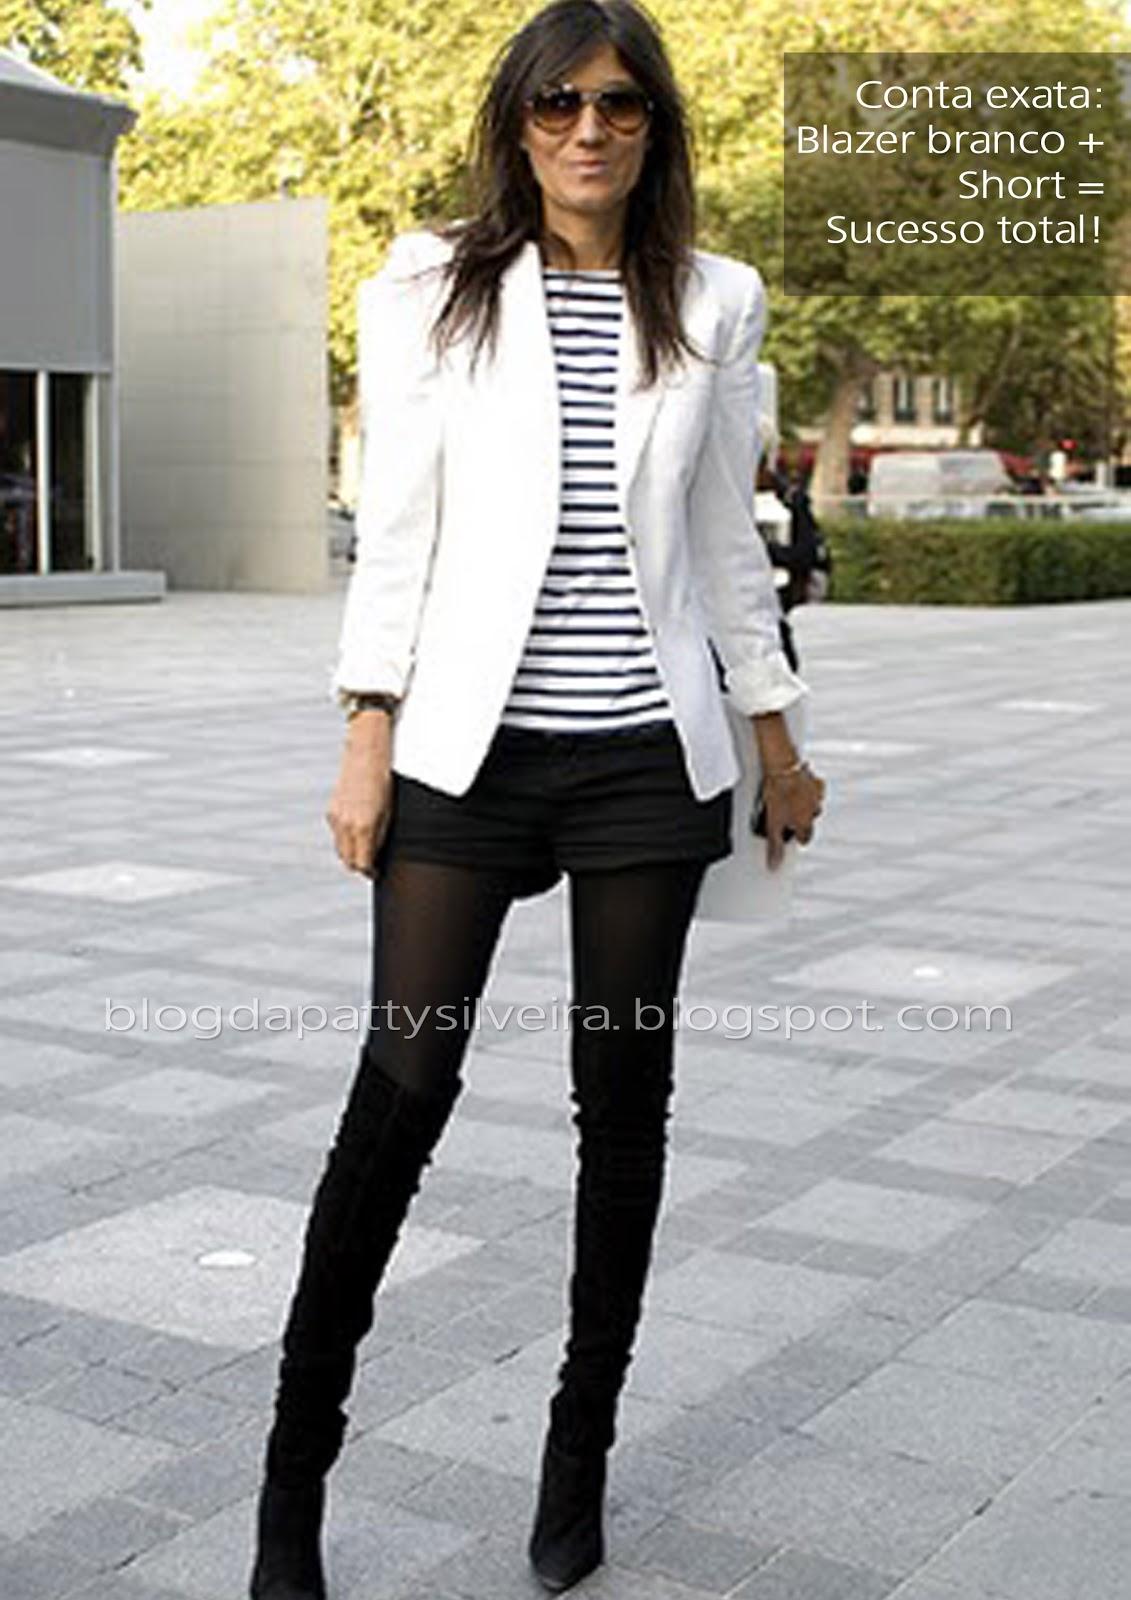 d5f1857bd Look blazer branco feminino Pesquisa Google officE wEar